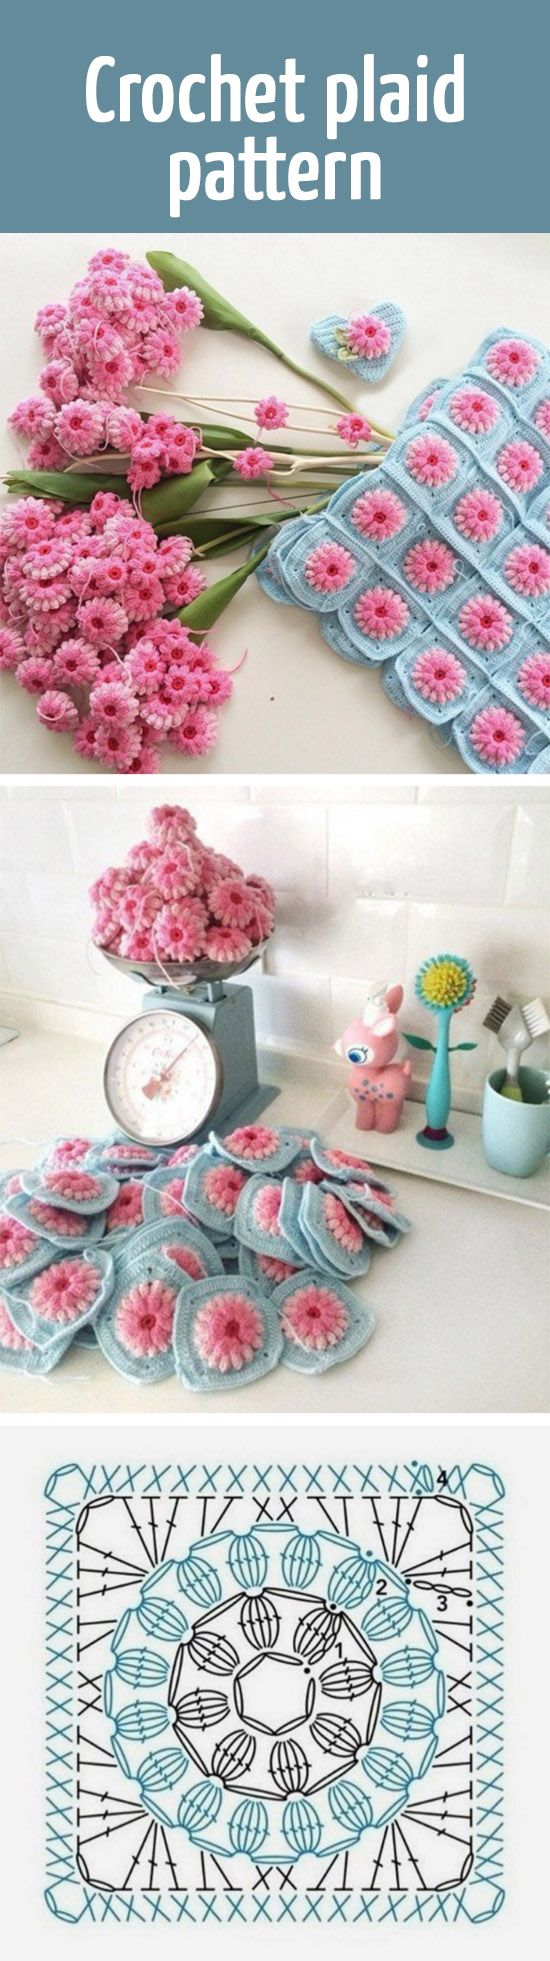 Crochet plaid pattern / вяжем крючком плед из квадратных мотивов